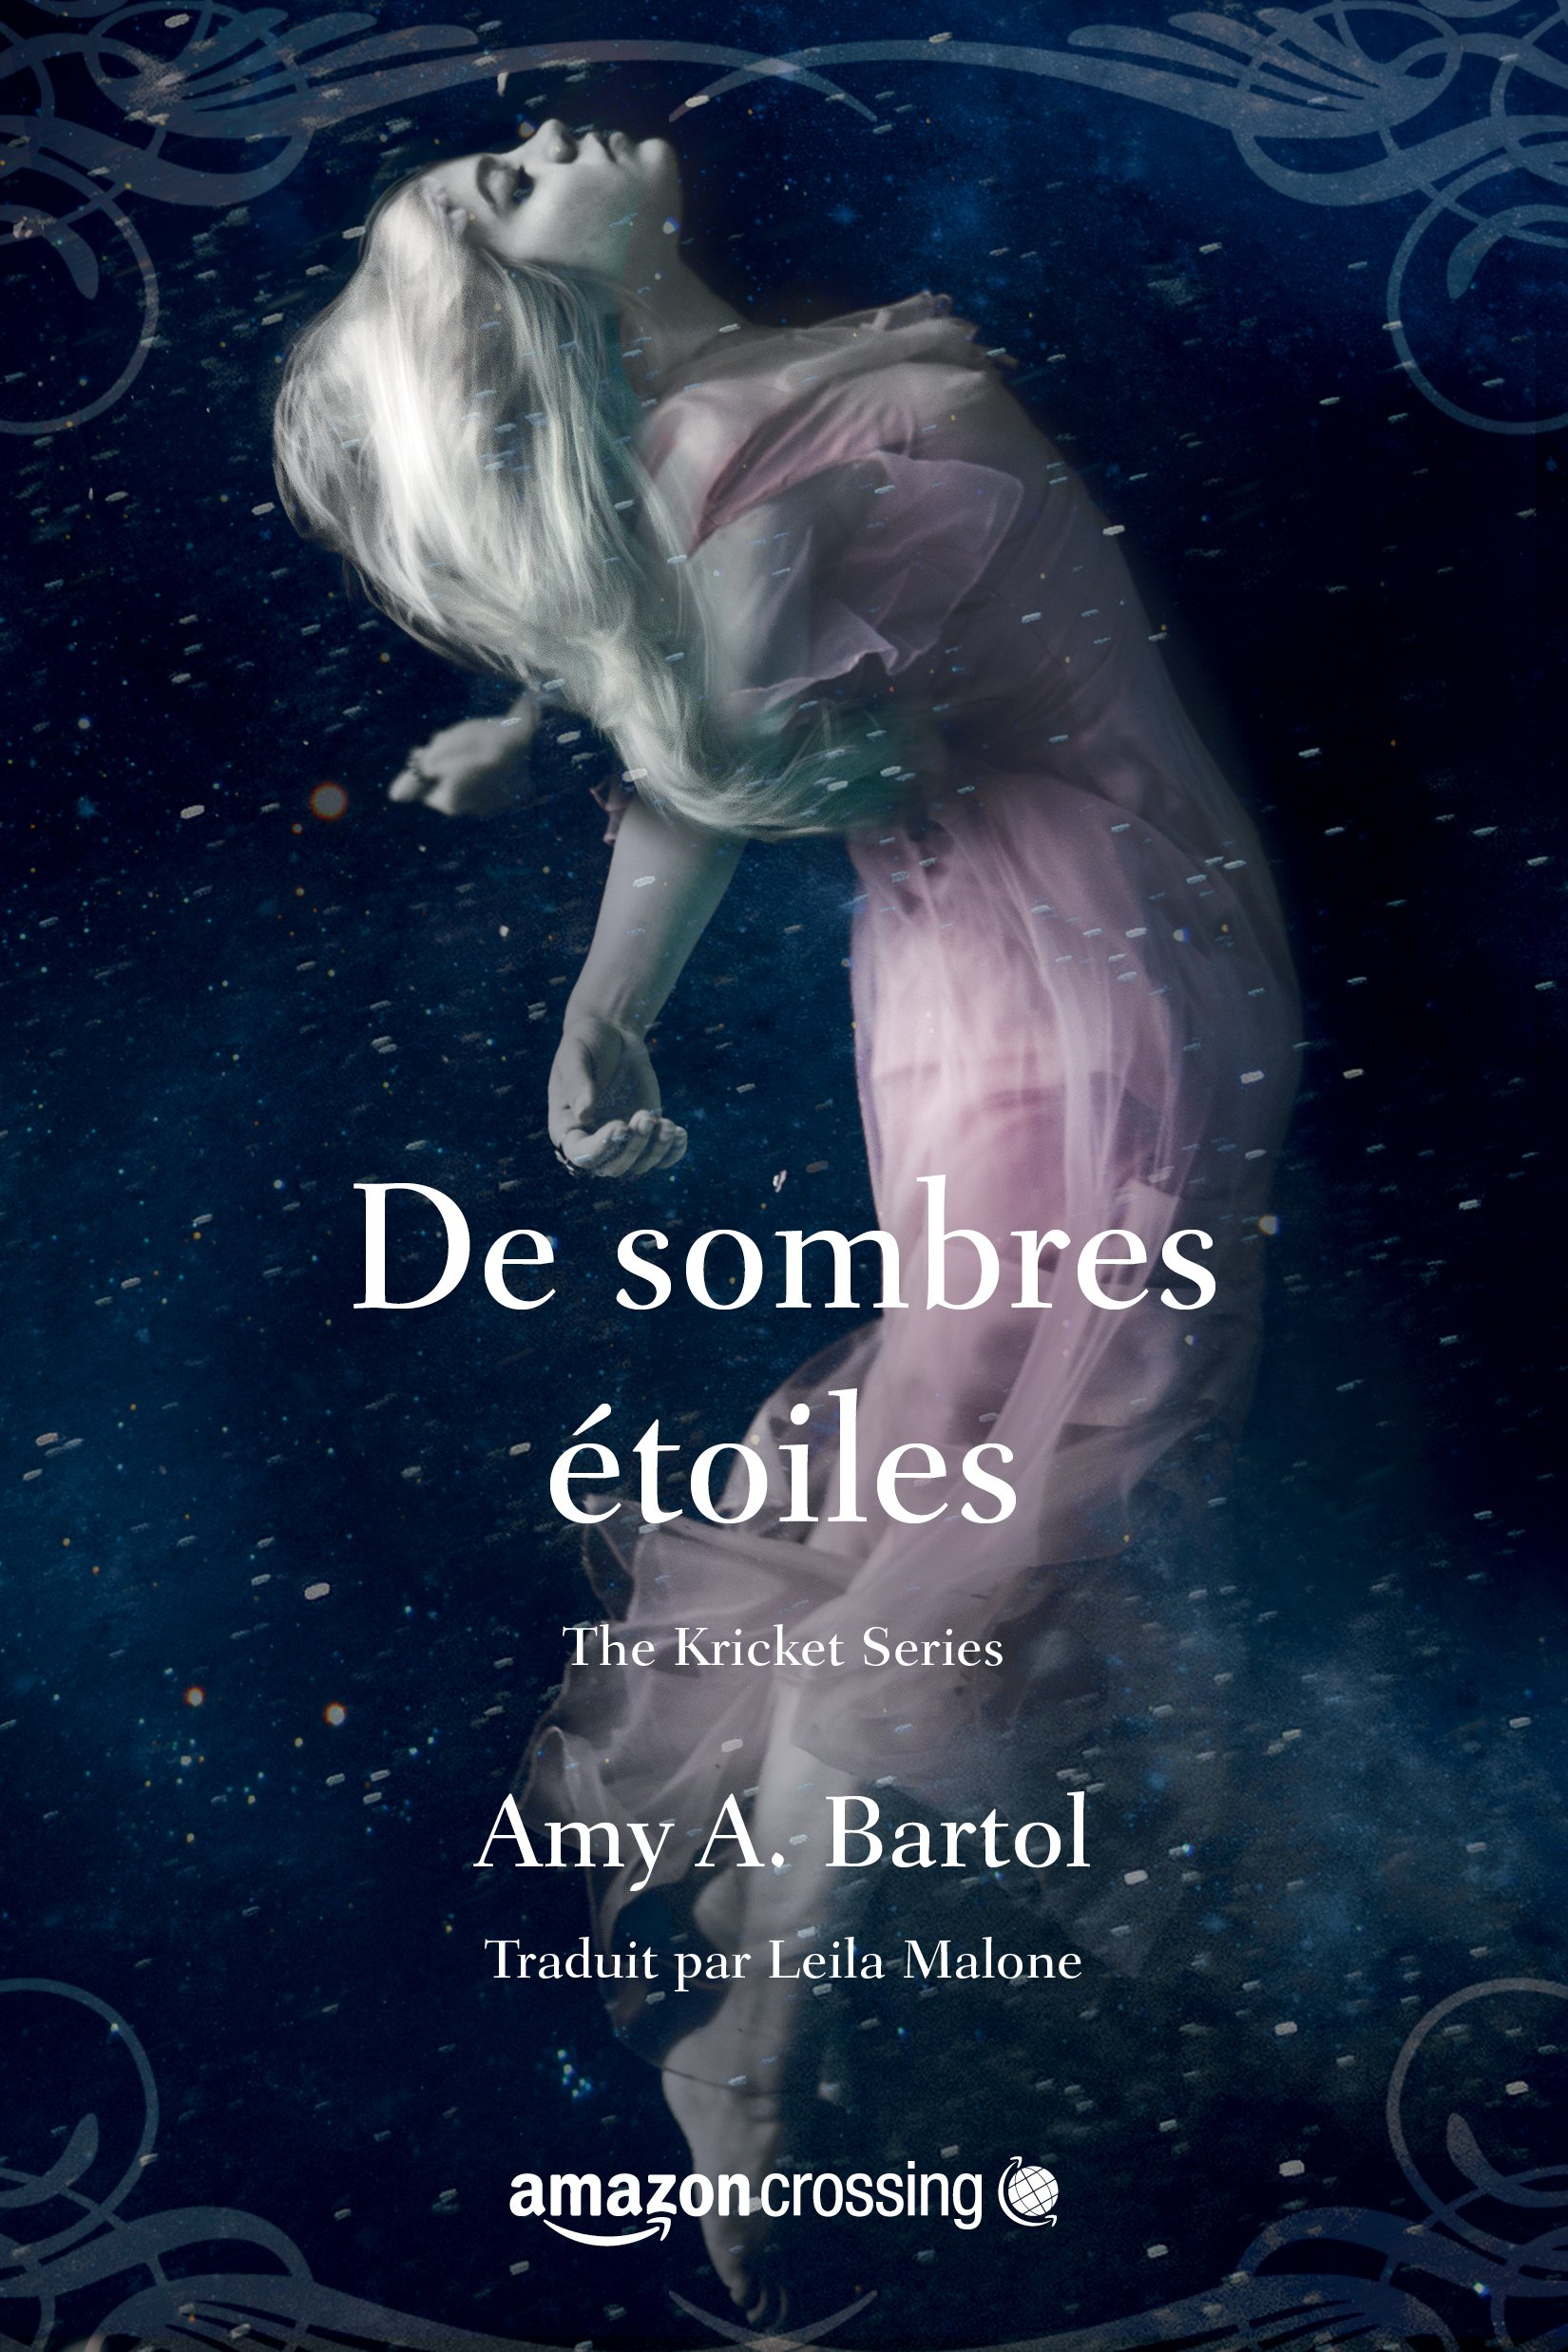 De sombres étoiles (Kricket t. 3) por Amy A. Bartol